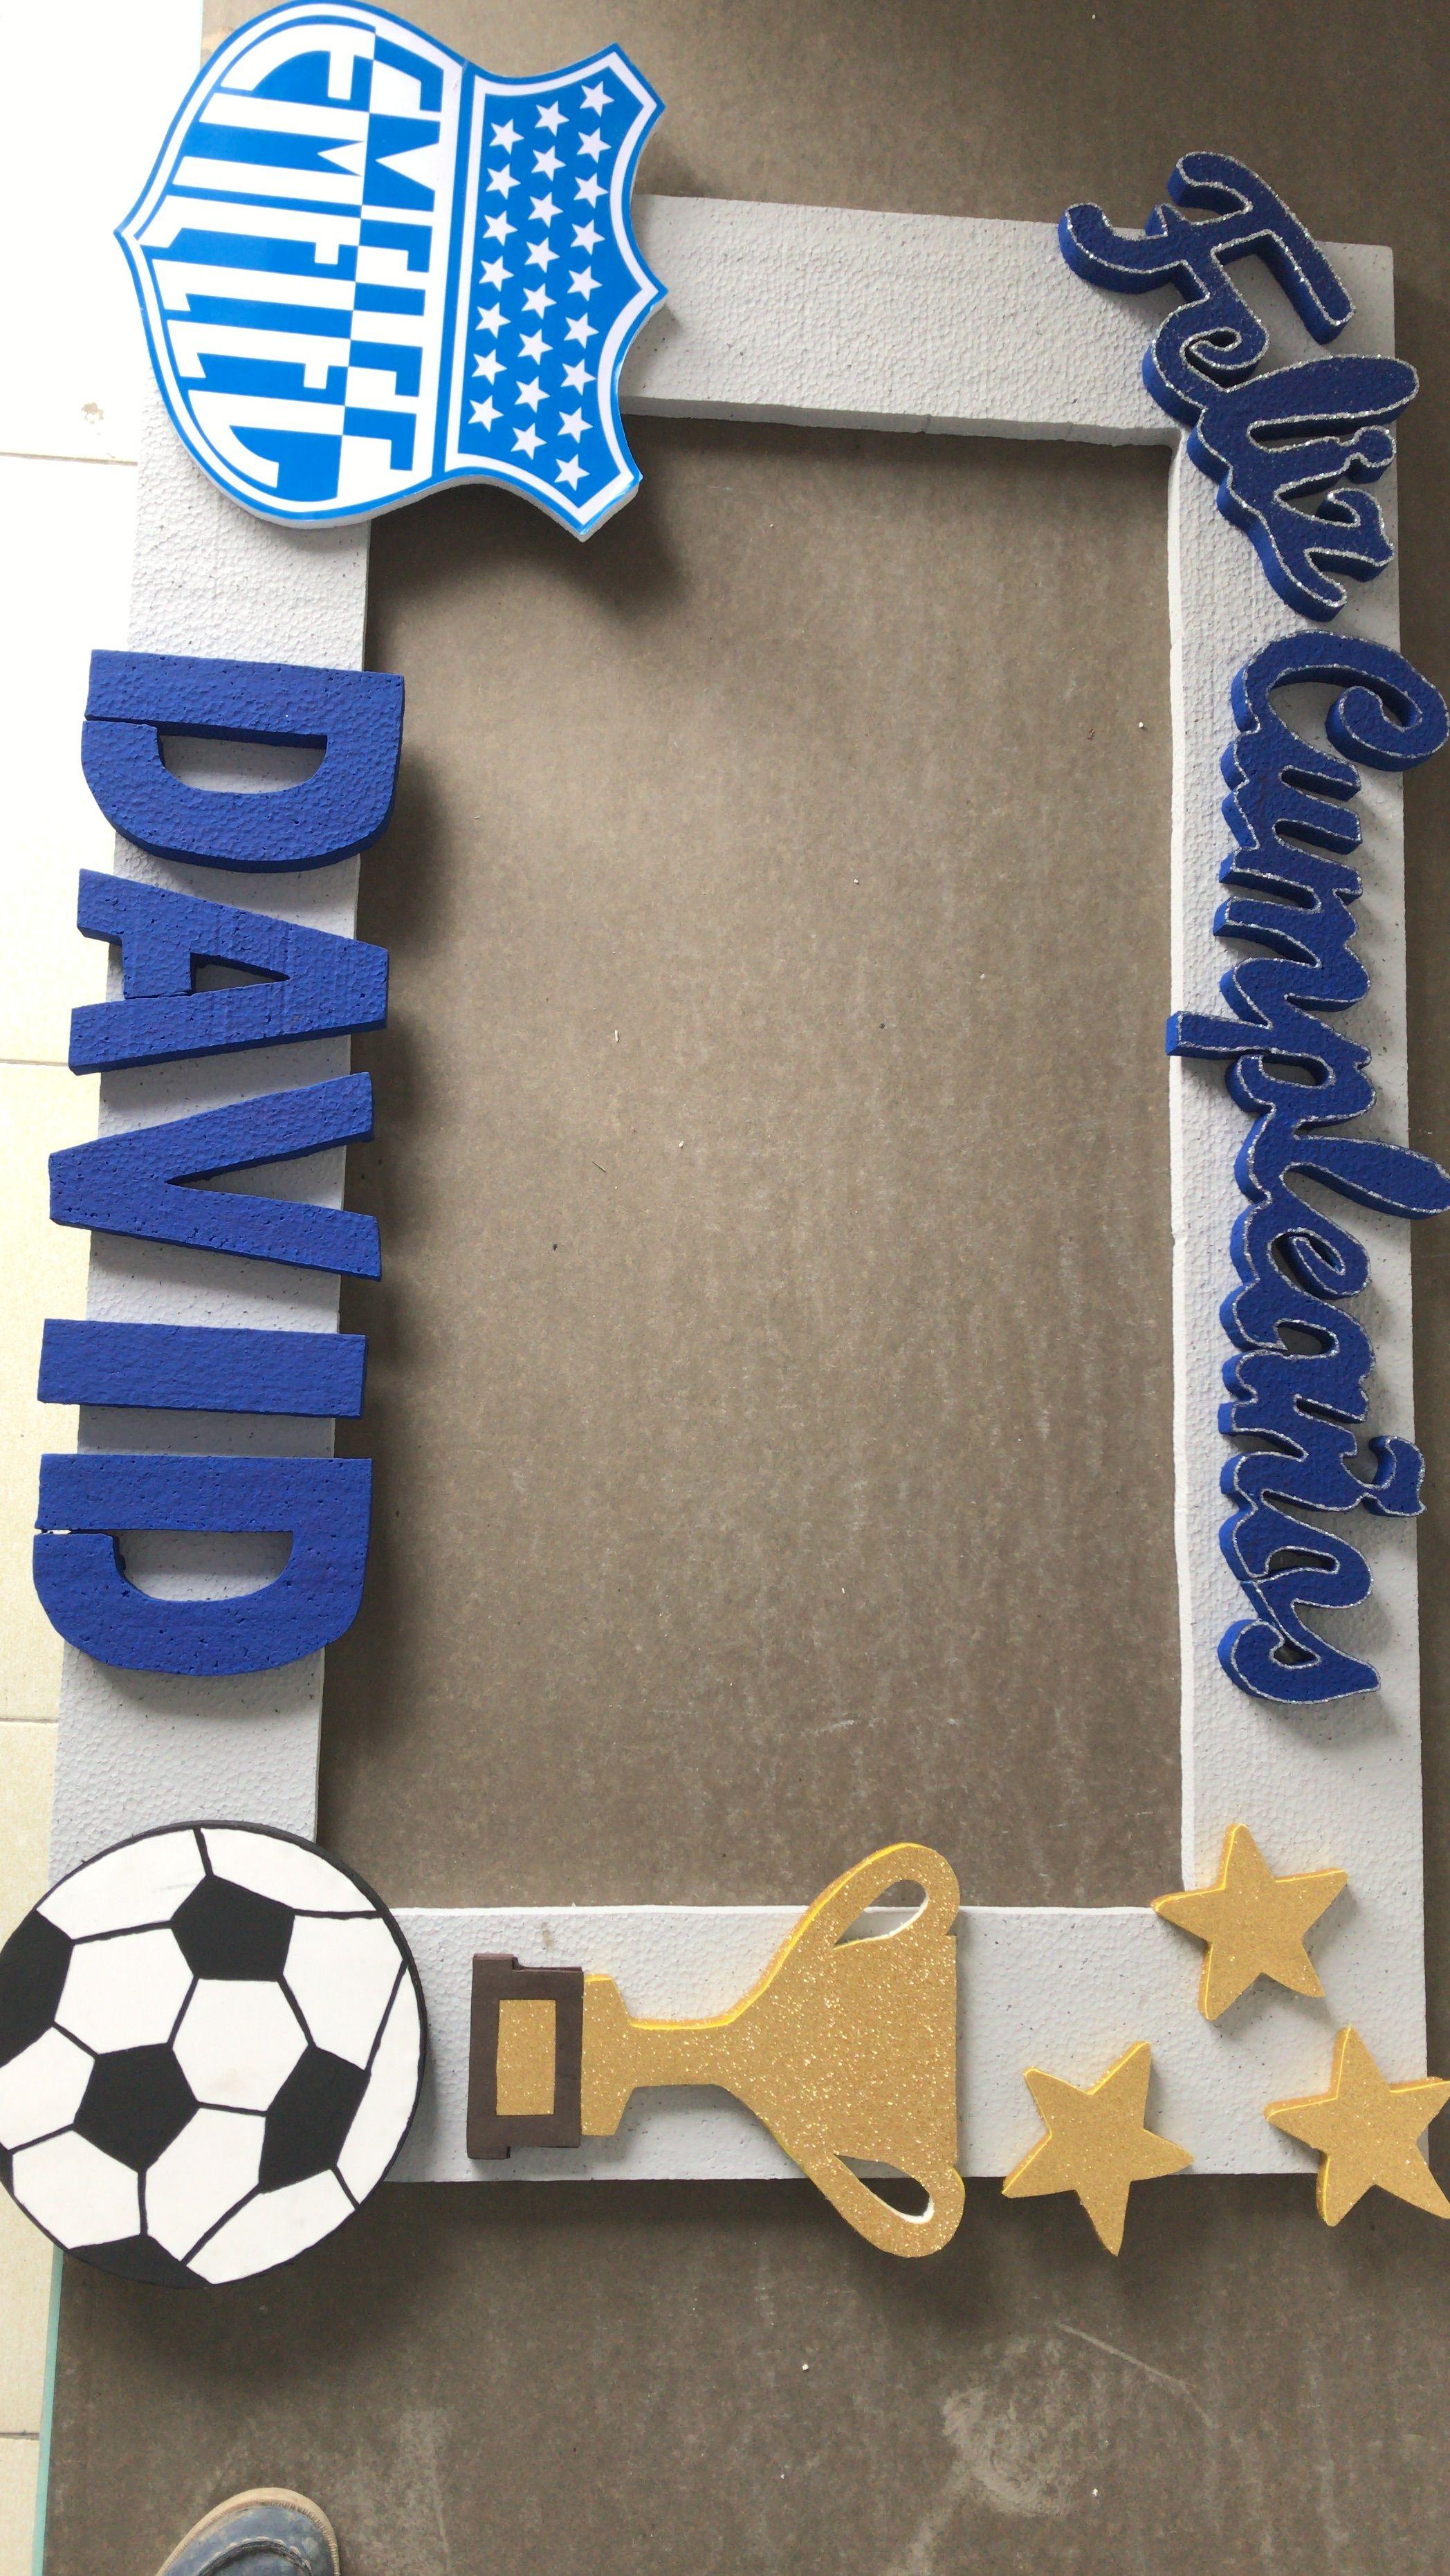 Temática Emelec. Marco para foto | marcos | Pinterest | Soccer party ...